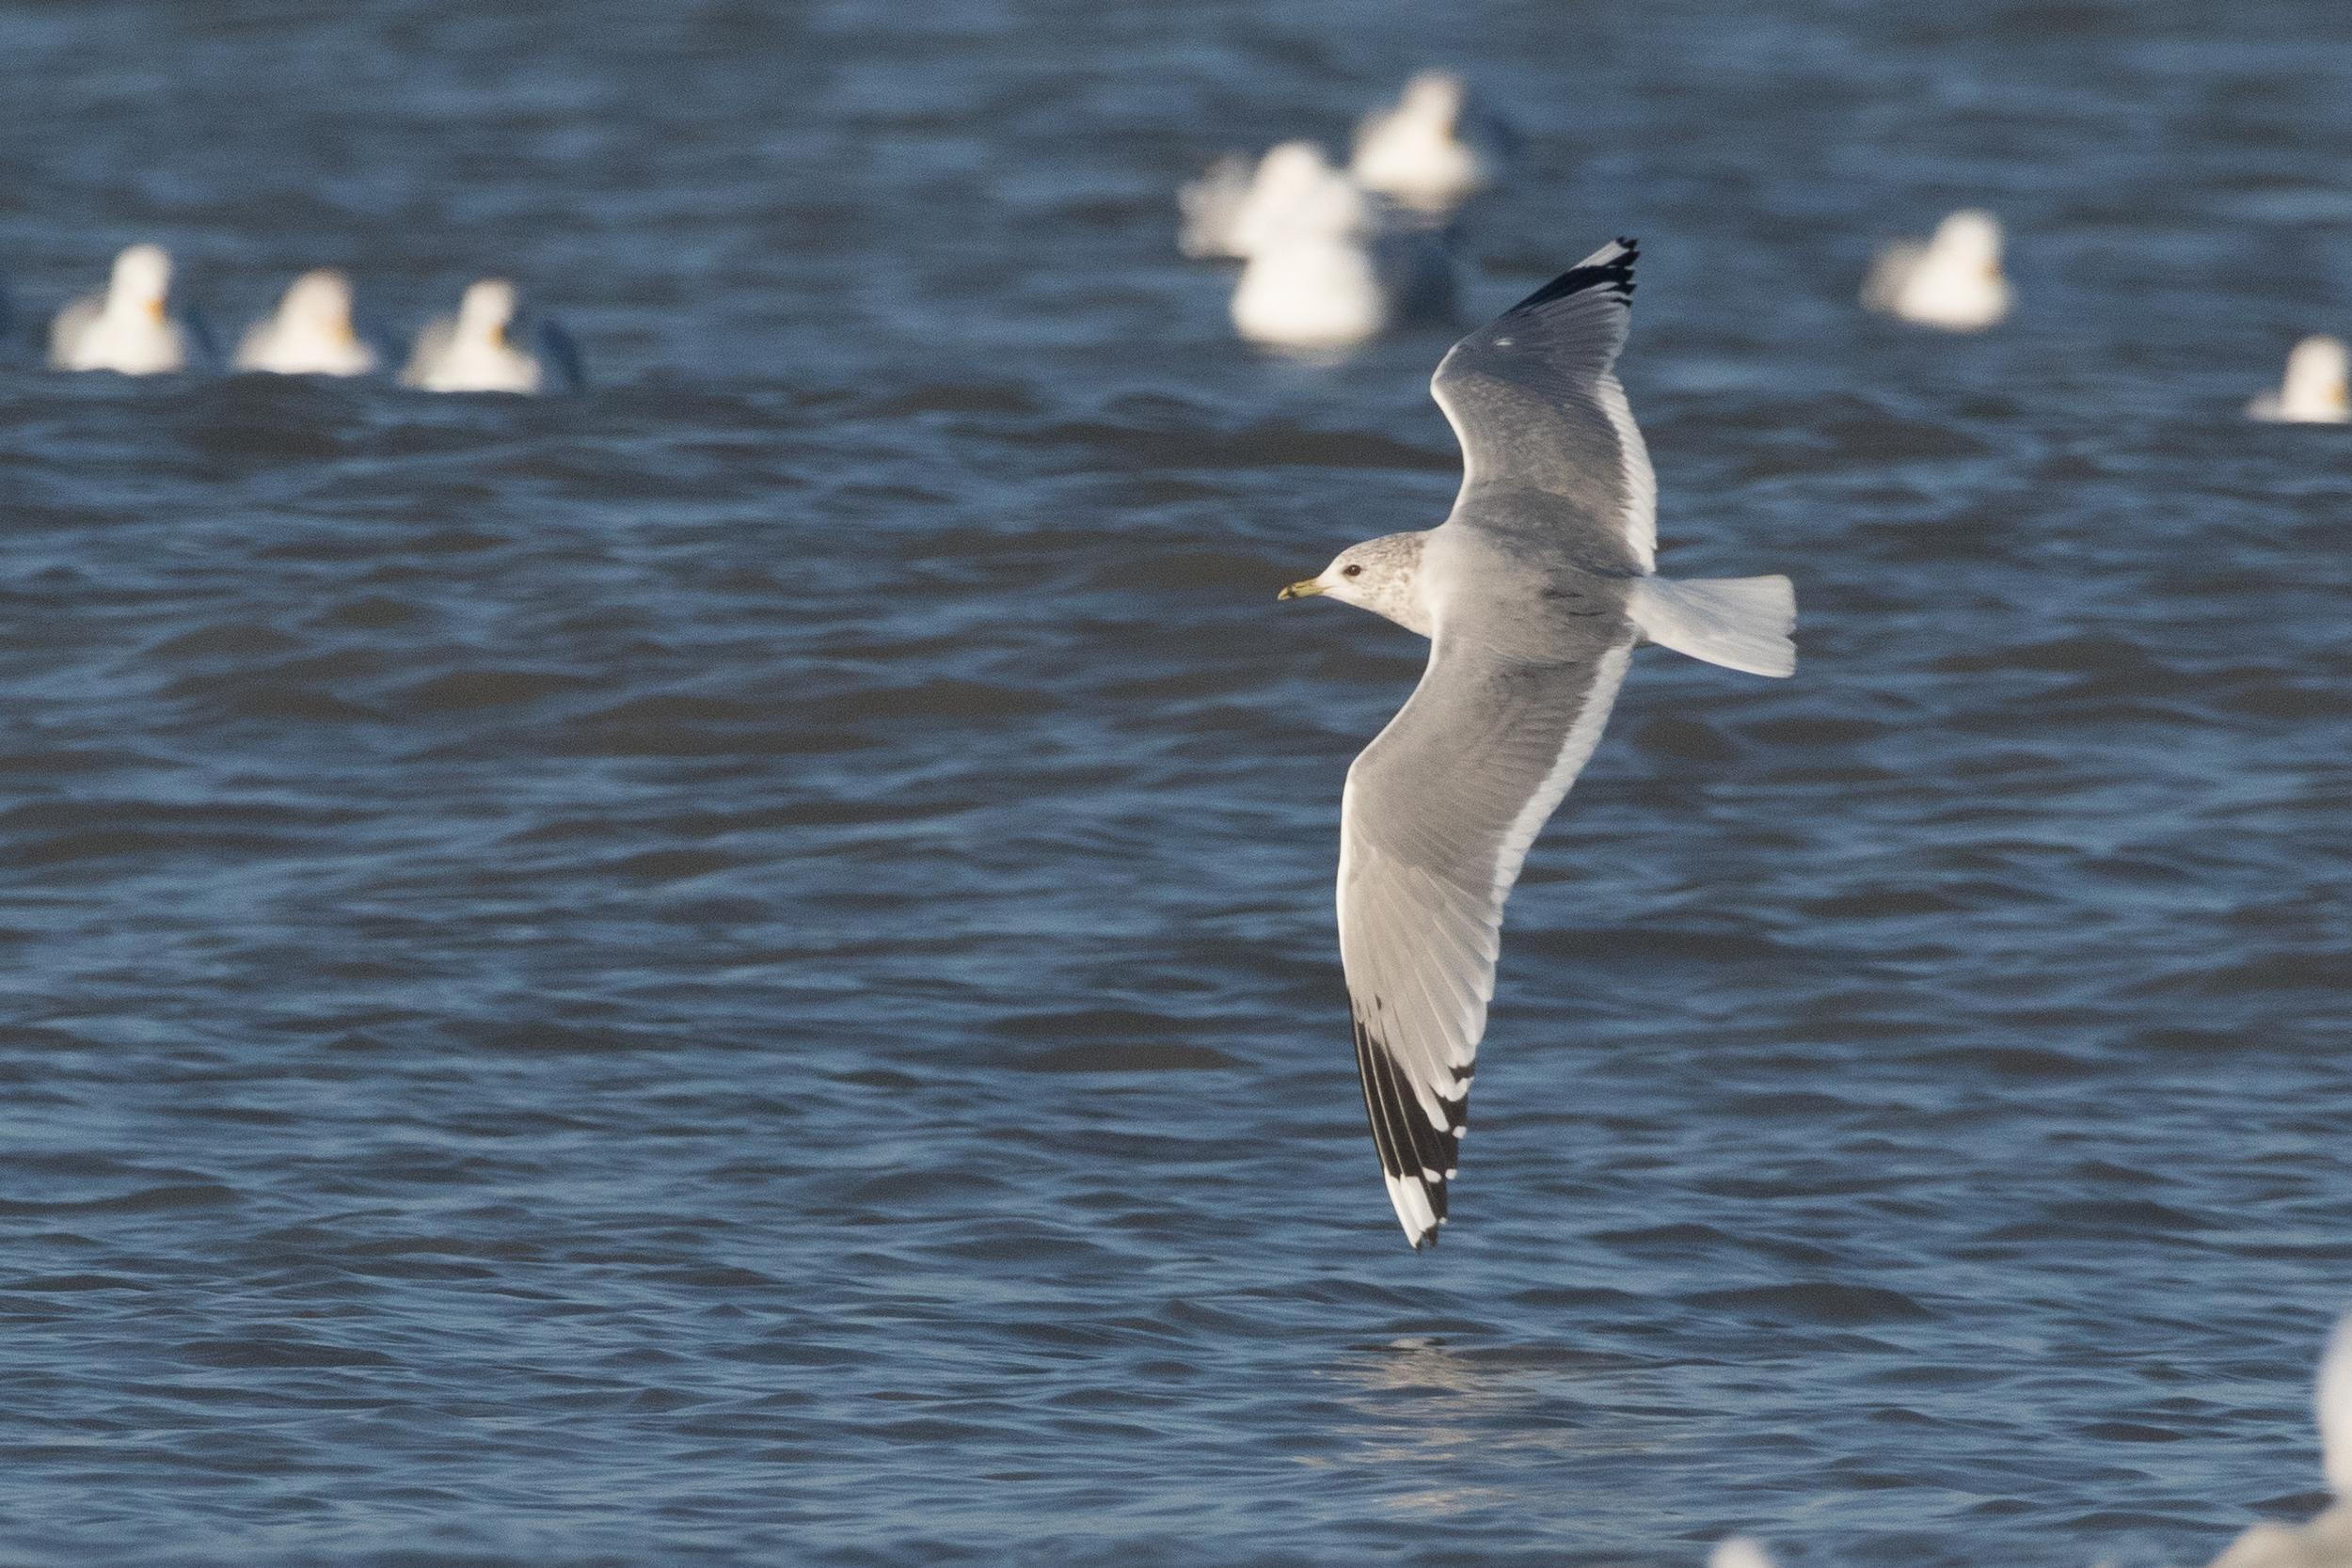 20170121-Common Gull Adult-05.jpg